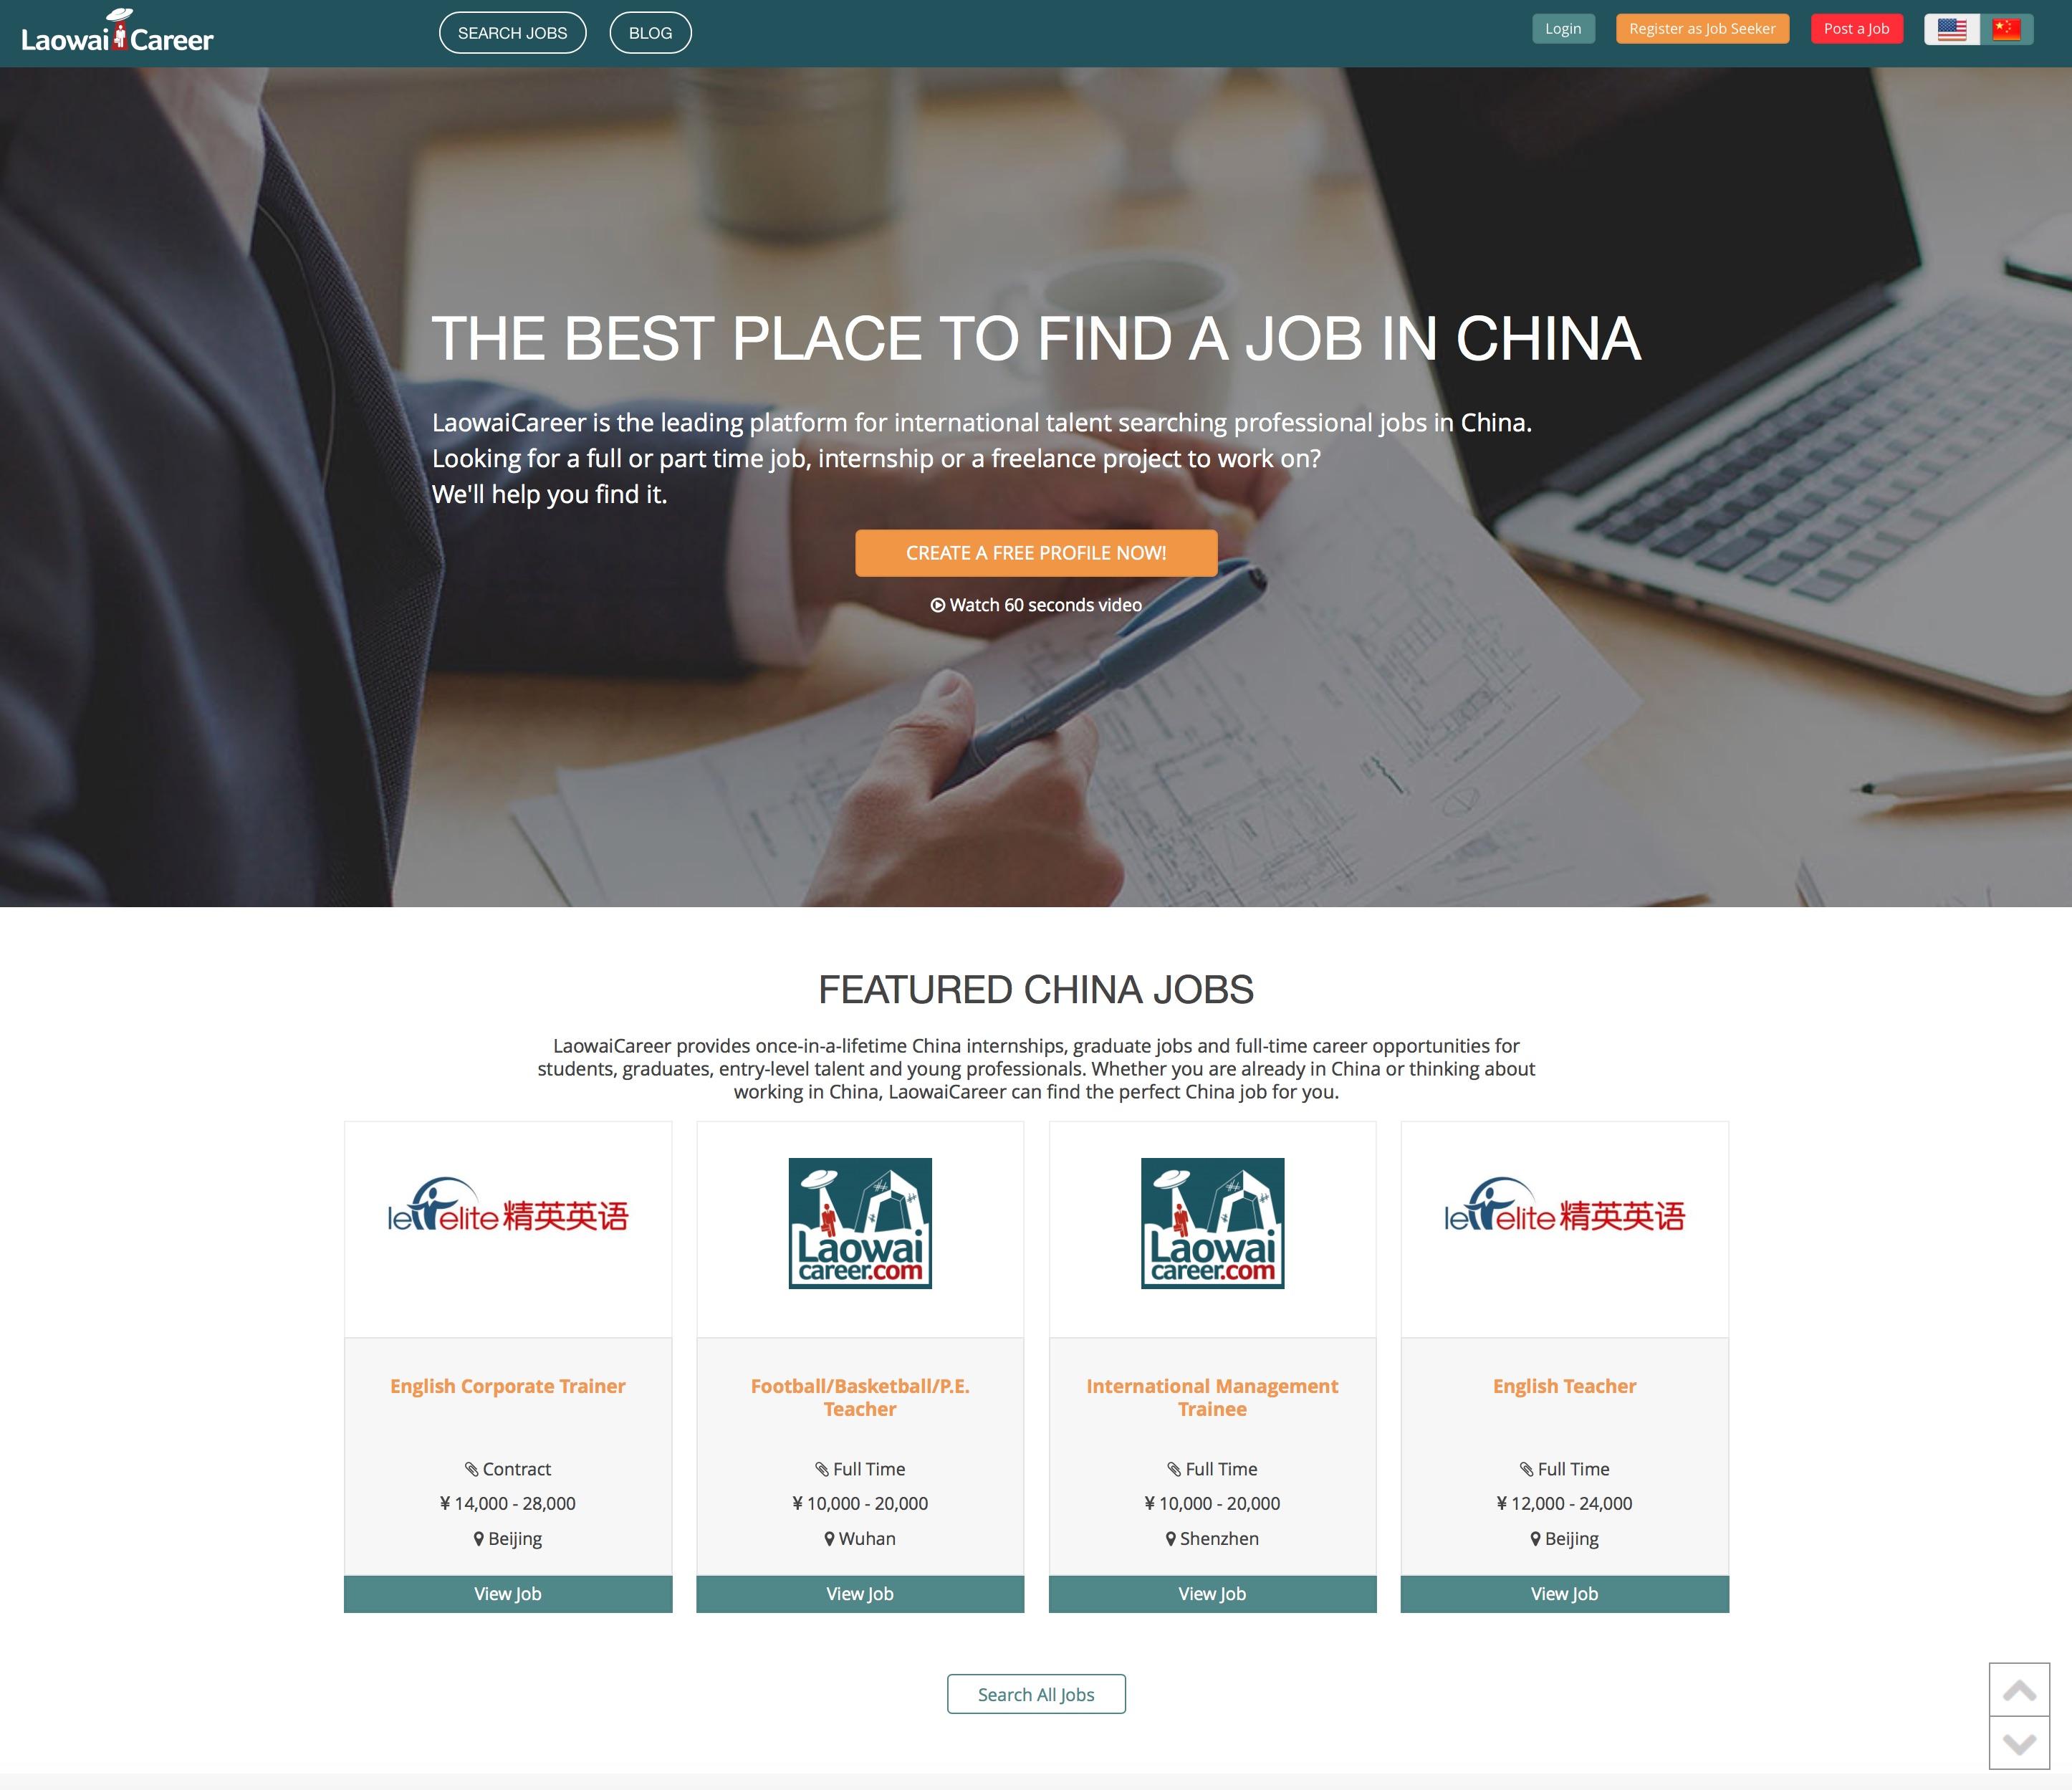 LaowaiCareer - Talent Recruitment Platform Demo - LaowaiCareer: An International Talent Recruitment Platform